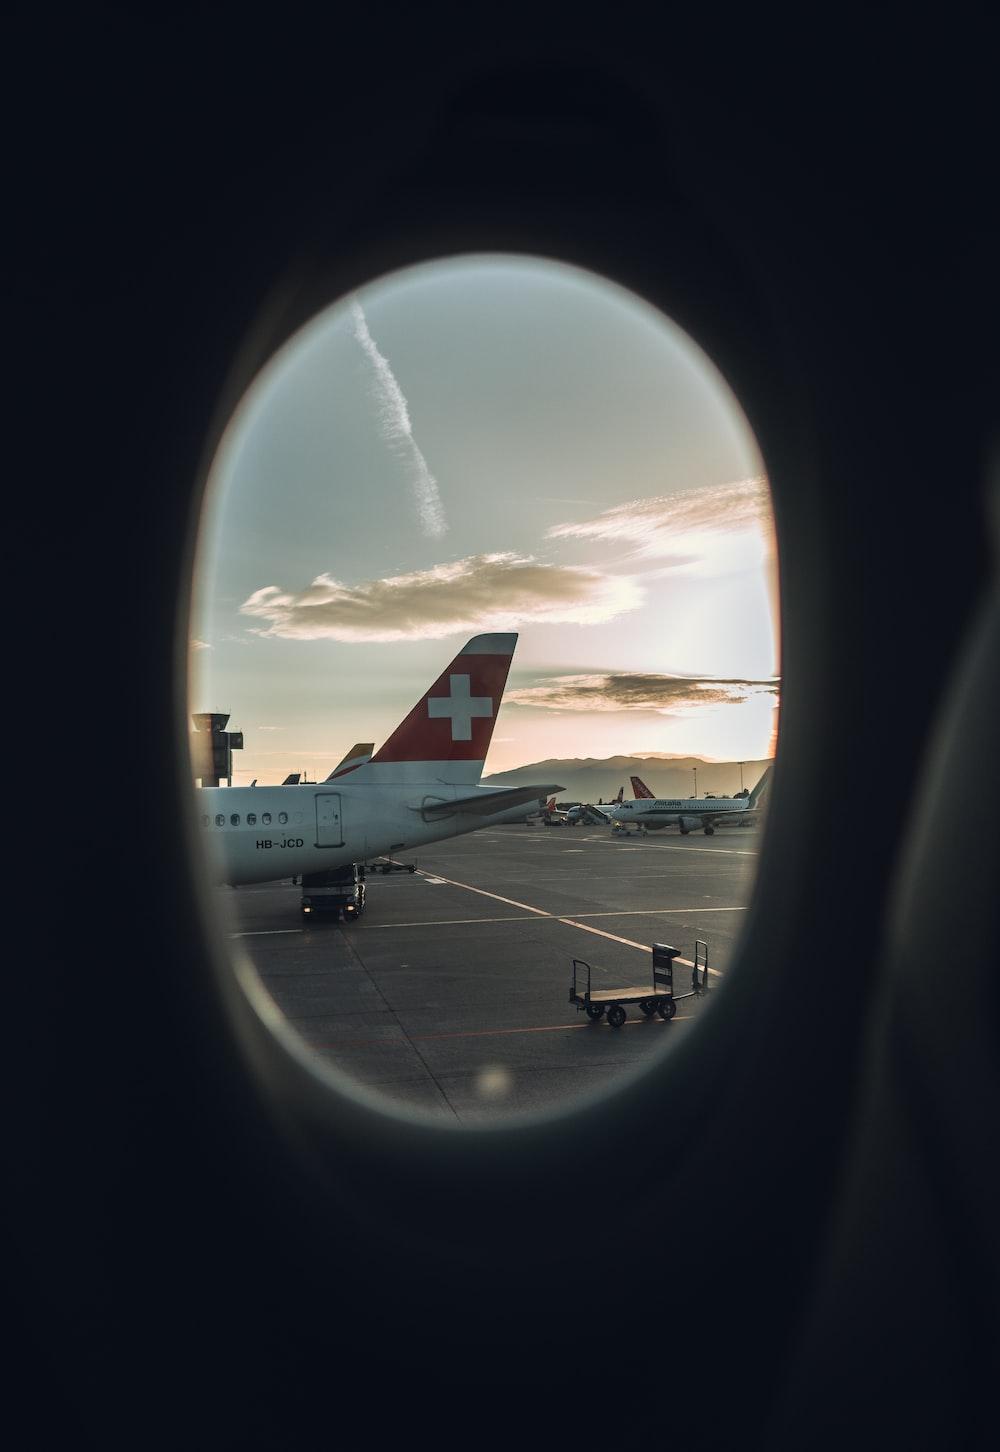 white plane on runway